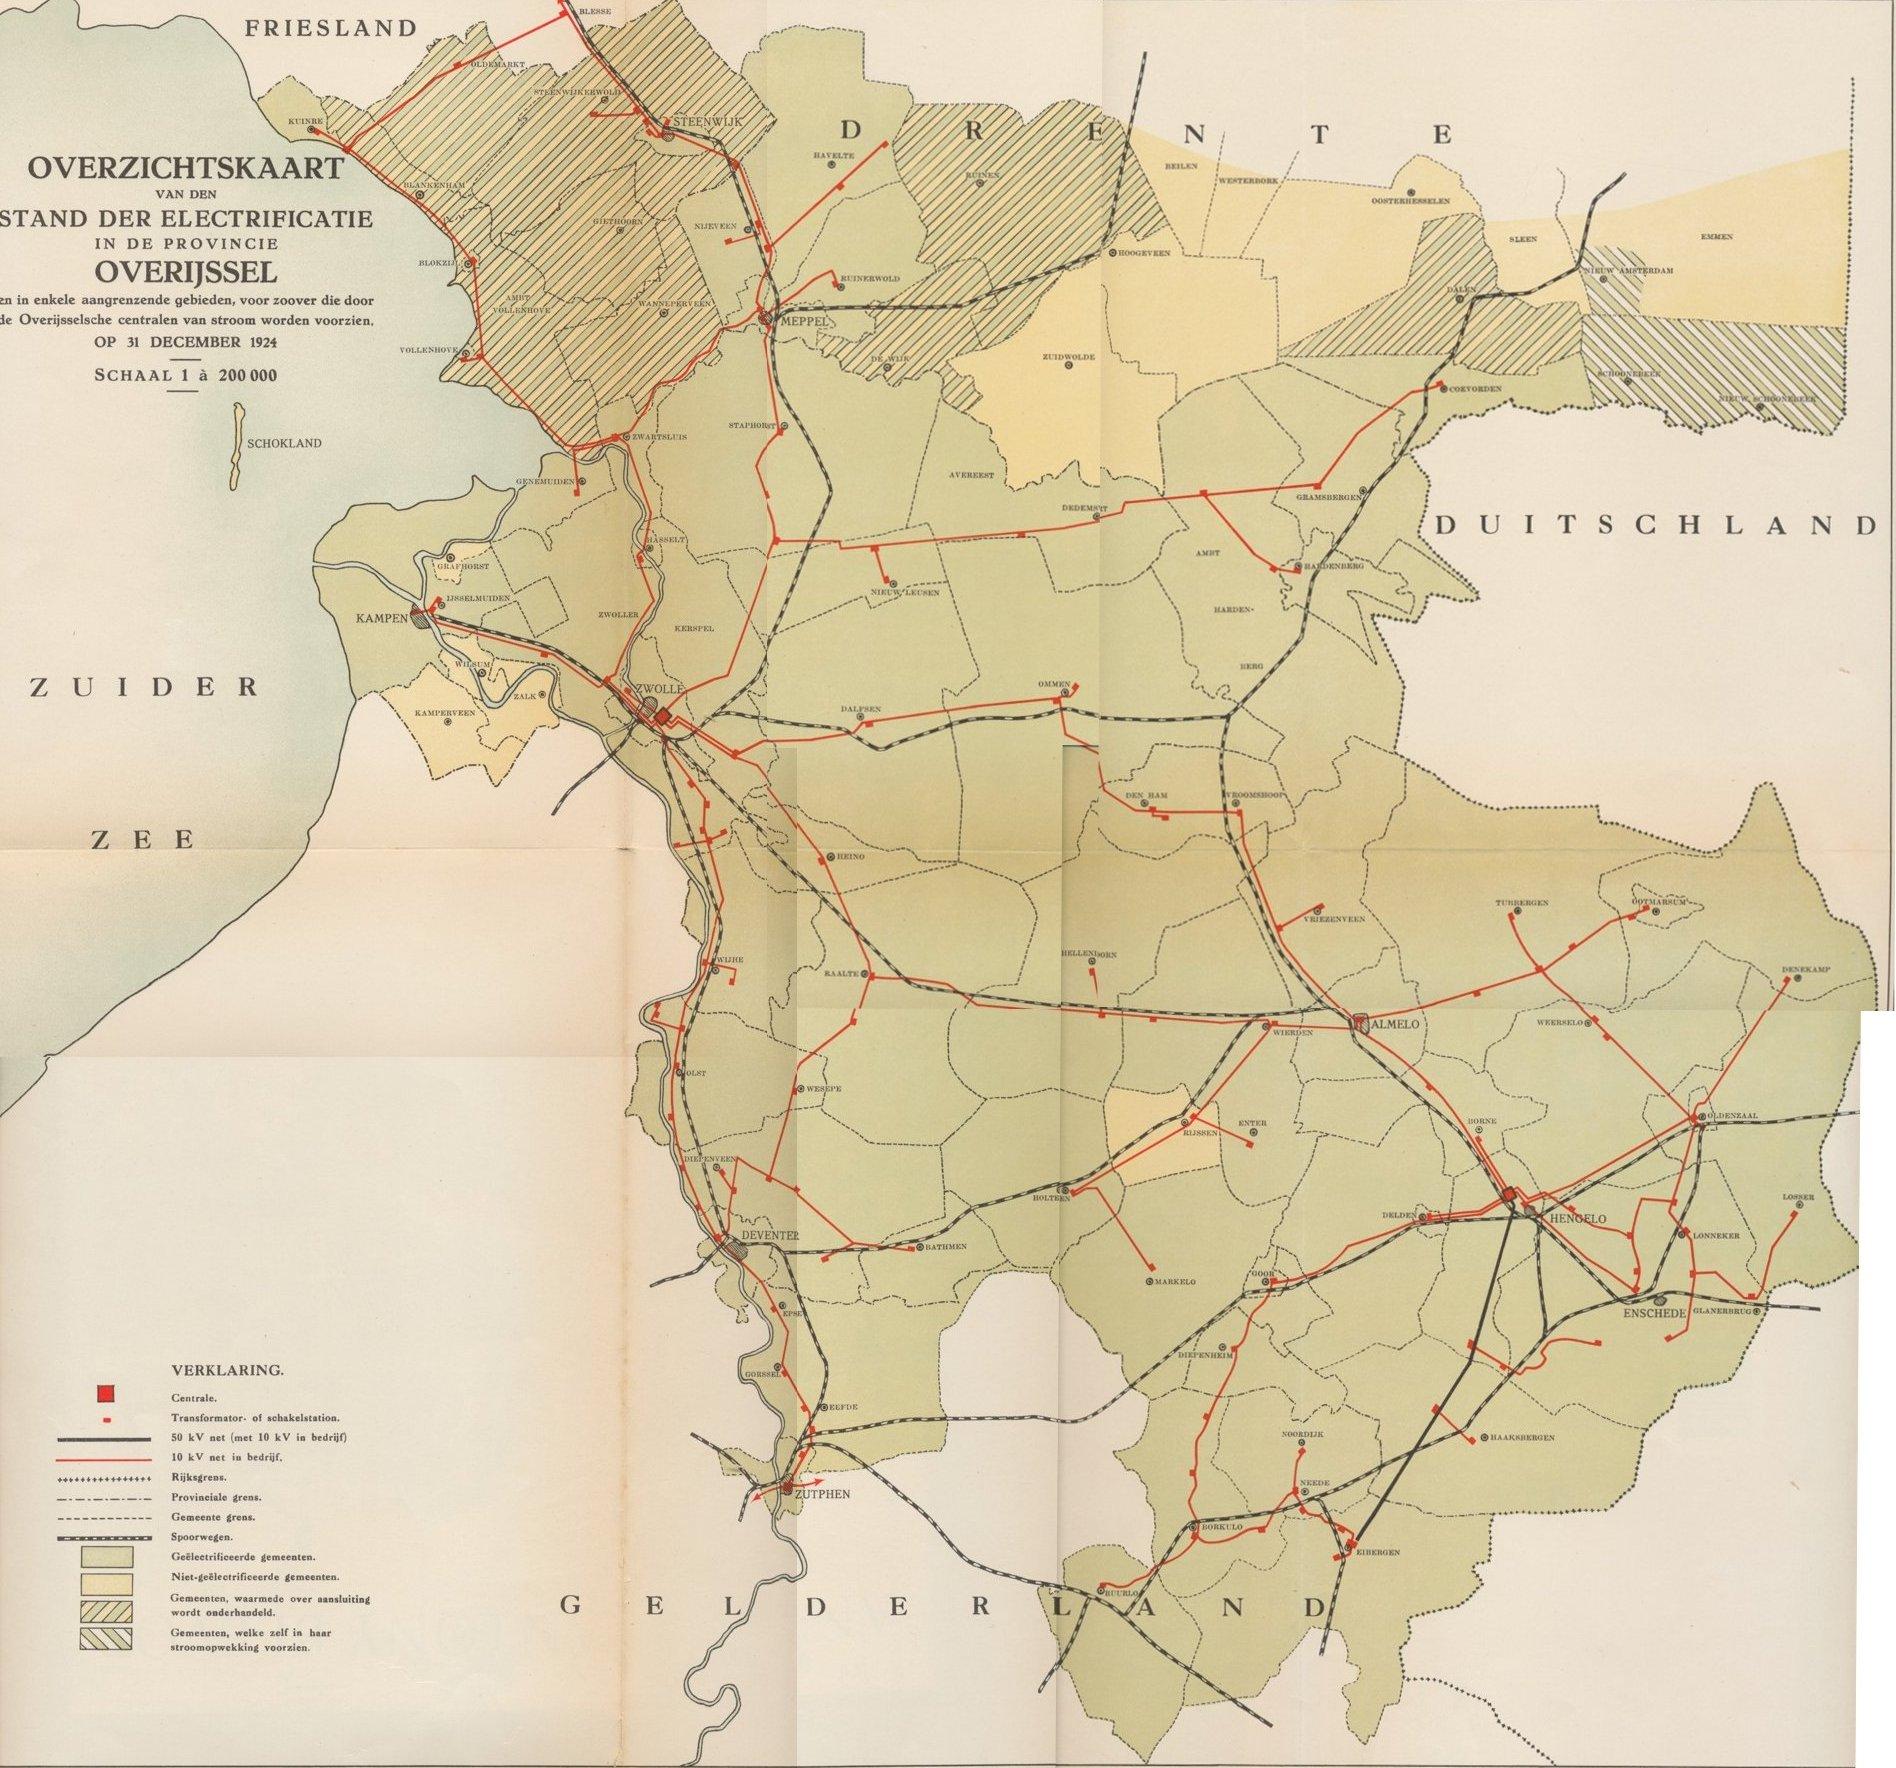 Netkaart IJsselmij 1924